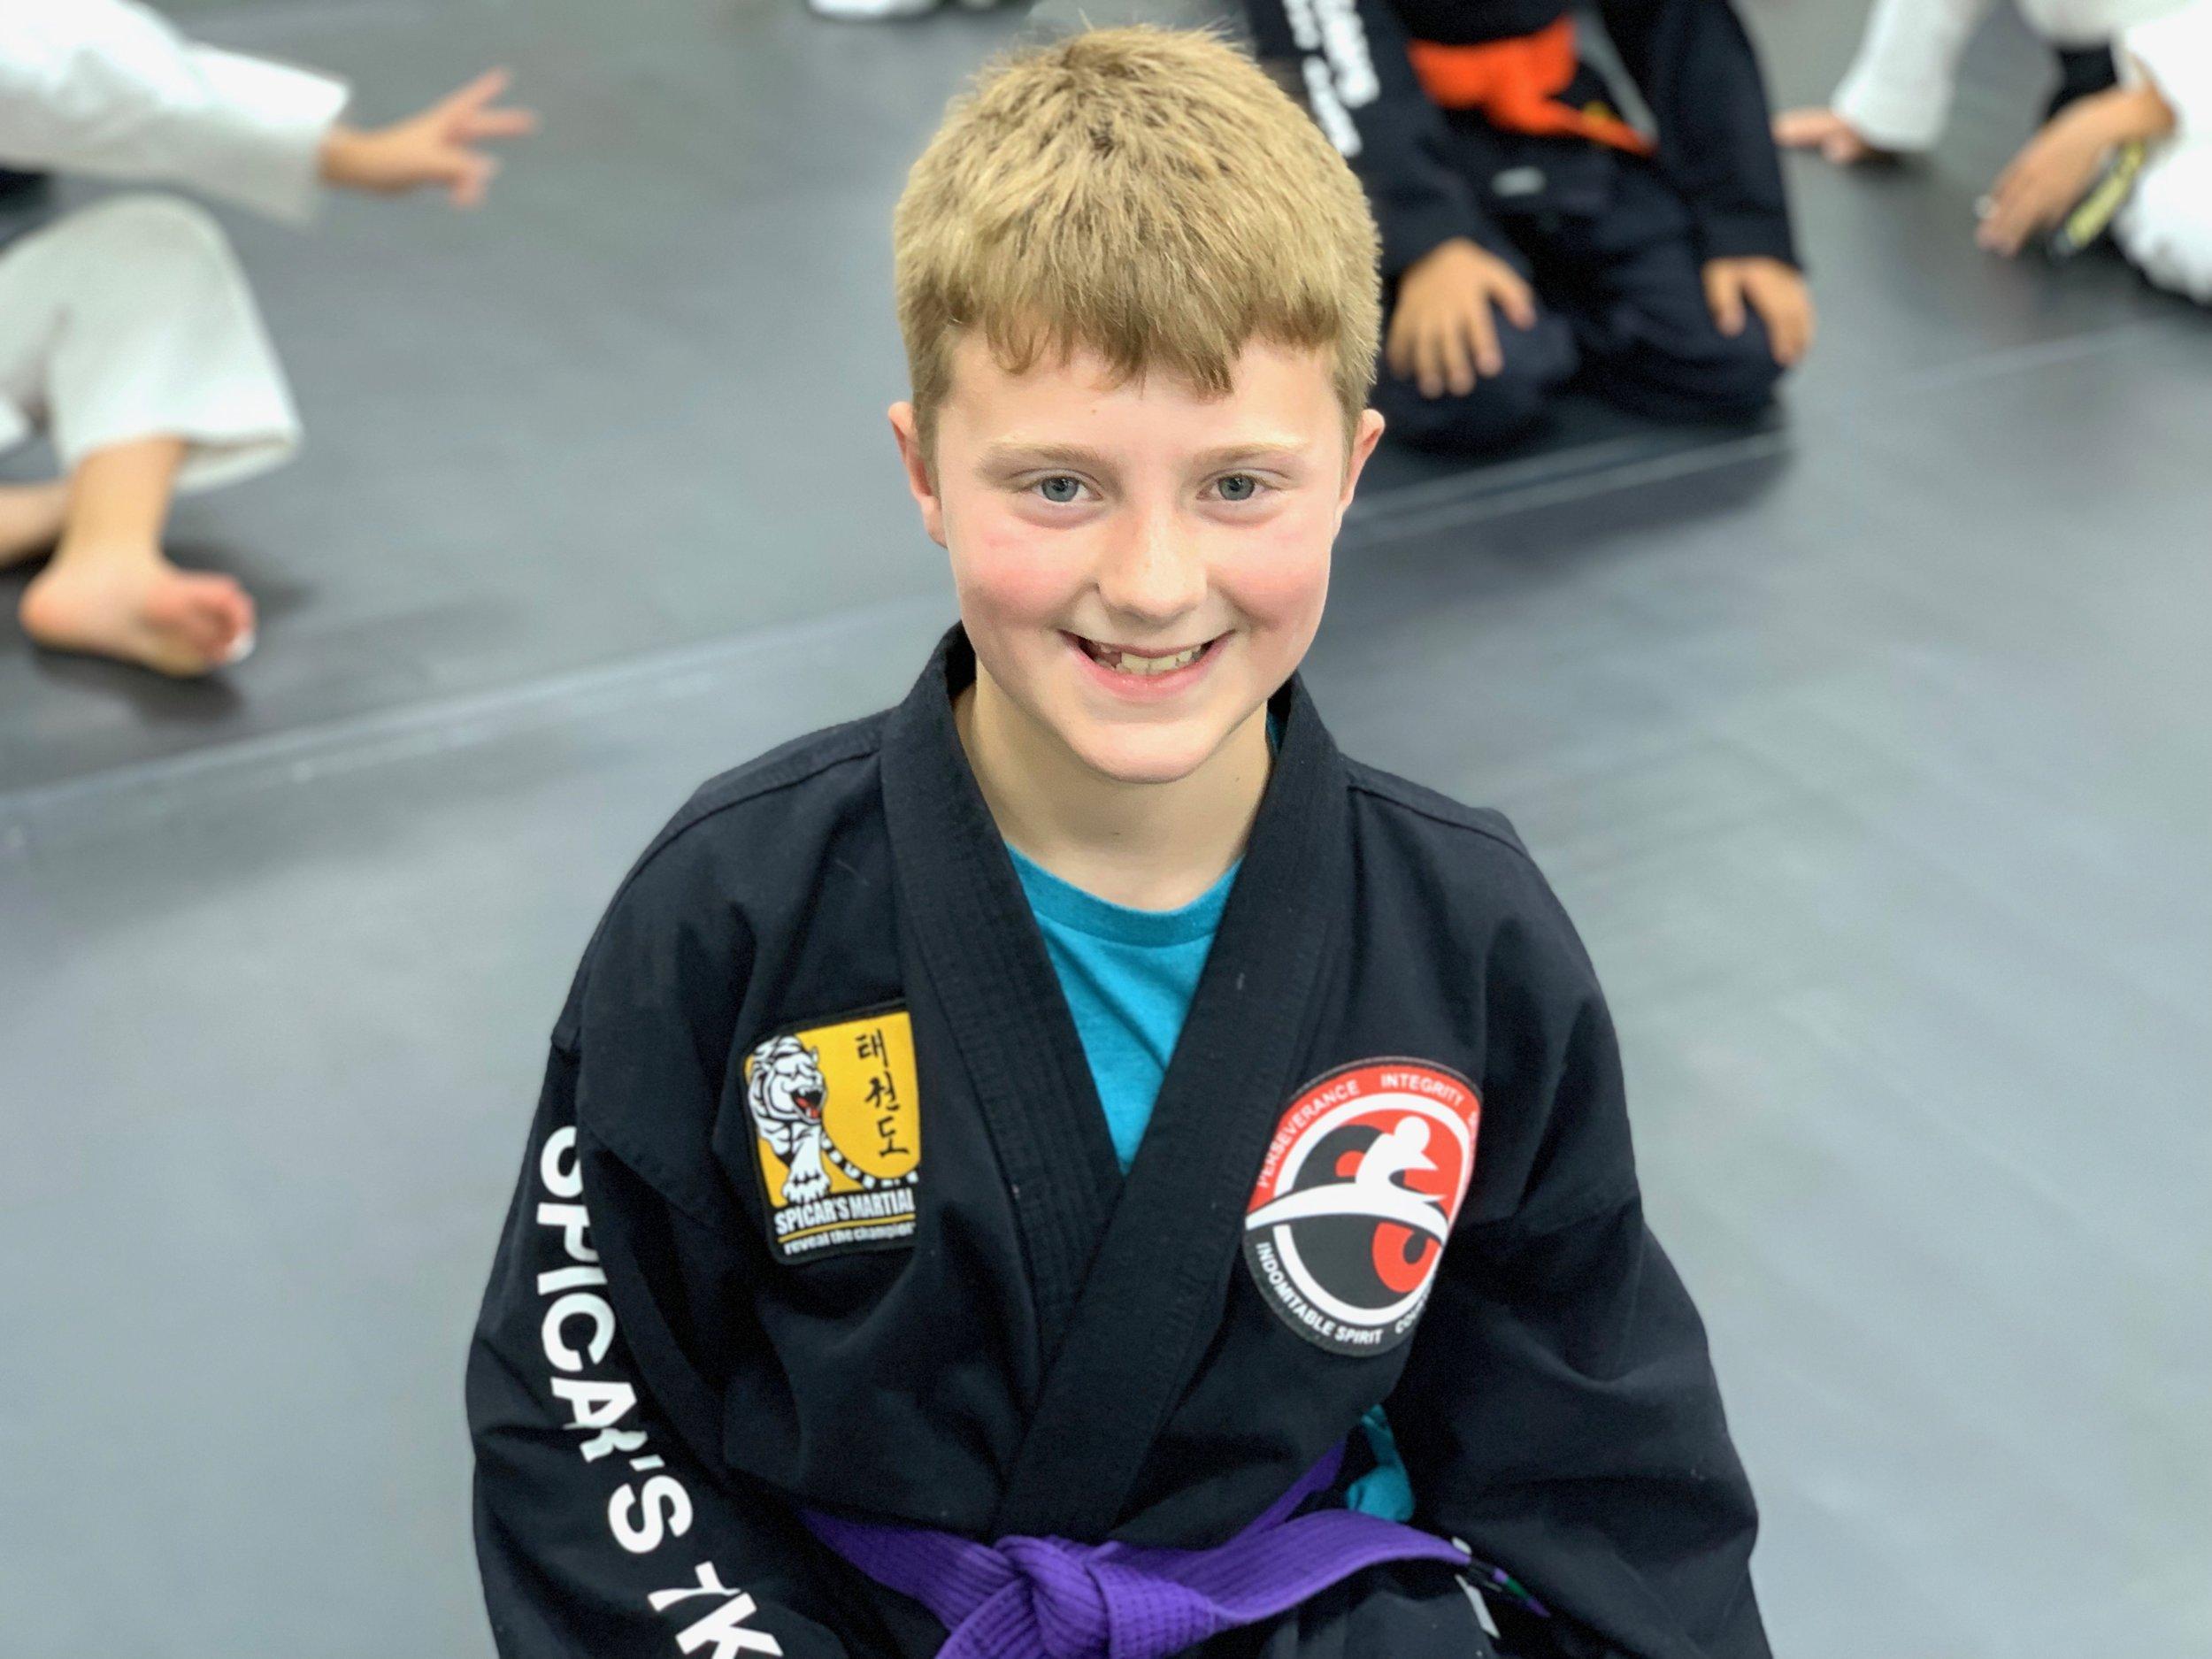 karate-kids-program-souhtlake-keller-grapevine-texas00032.jpeg